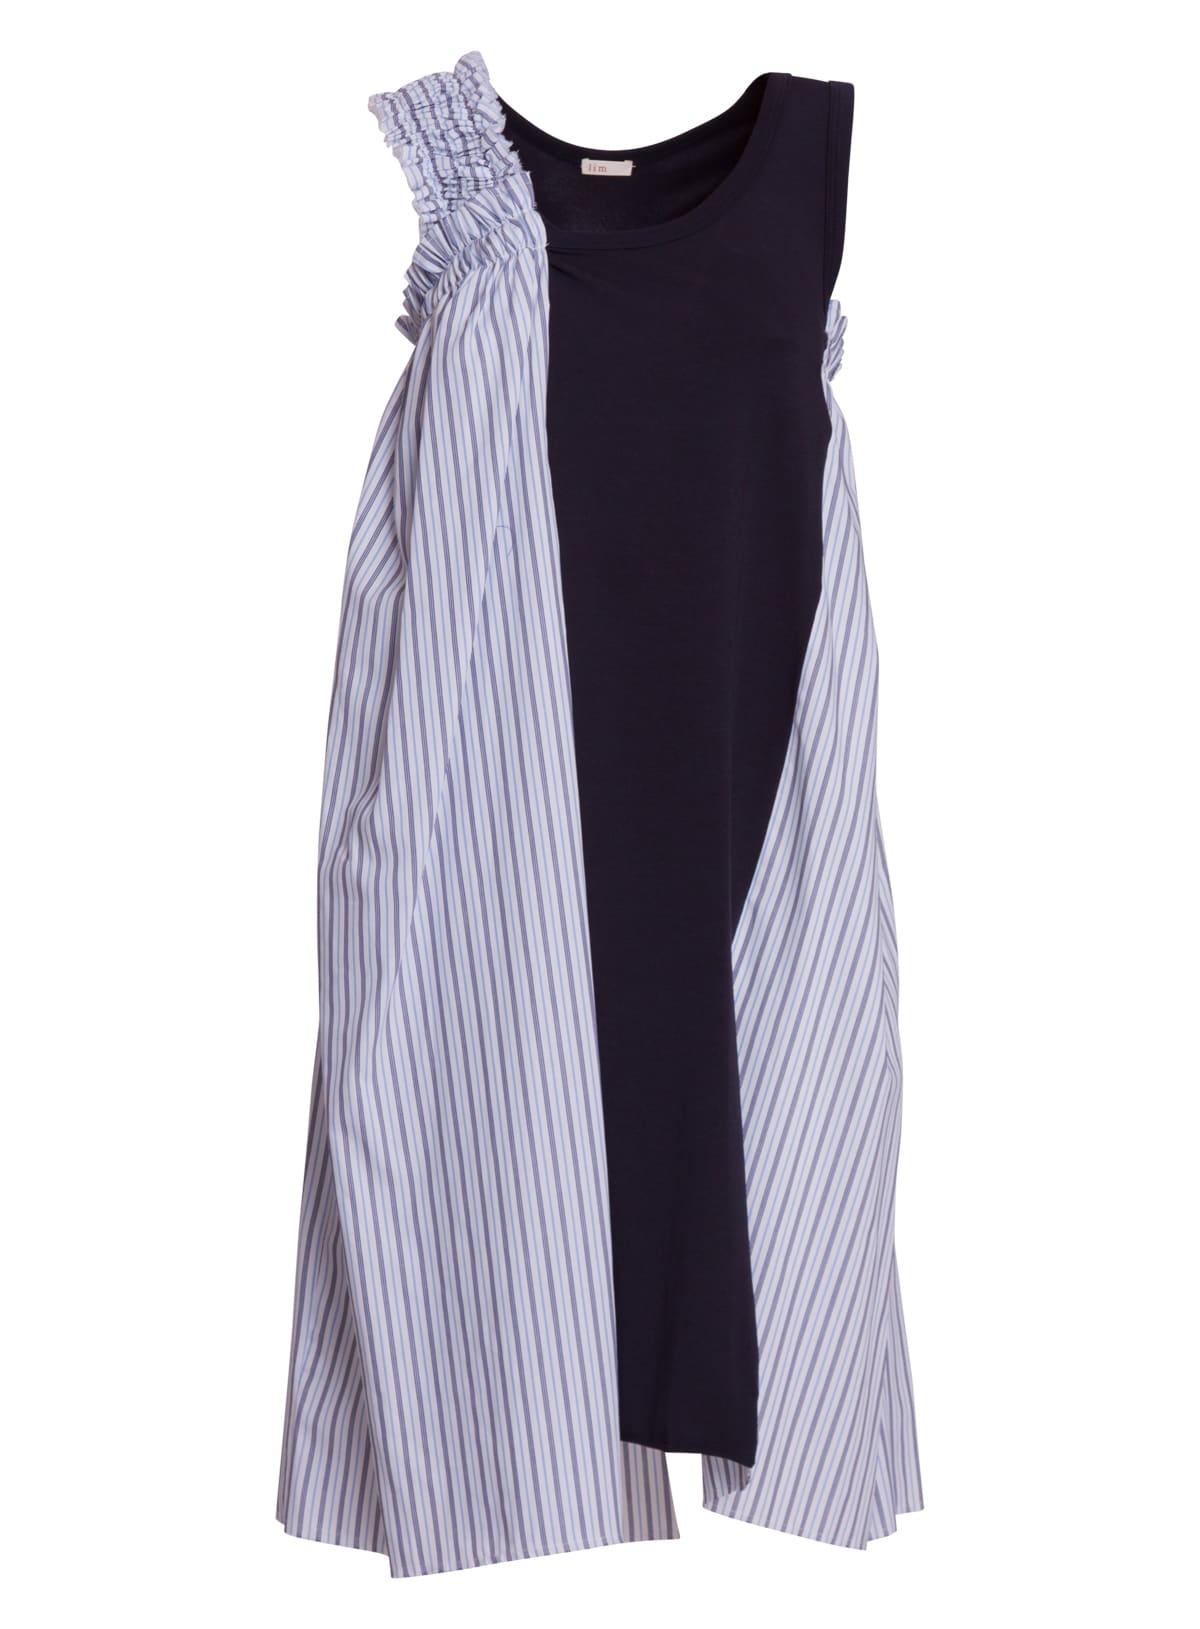 Lim S. Mortari Stripes Dress